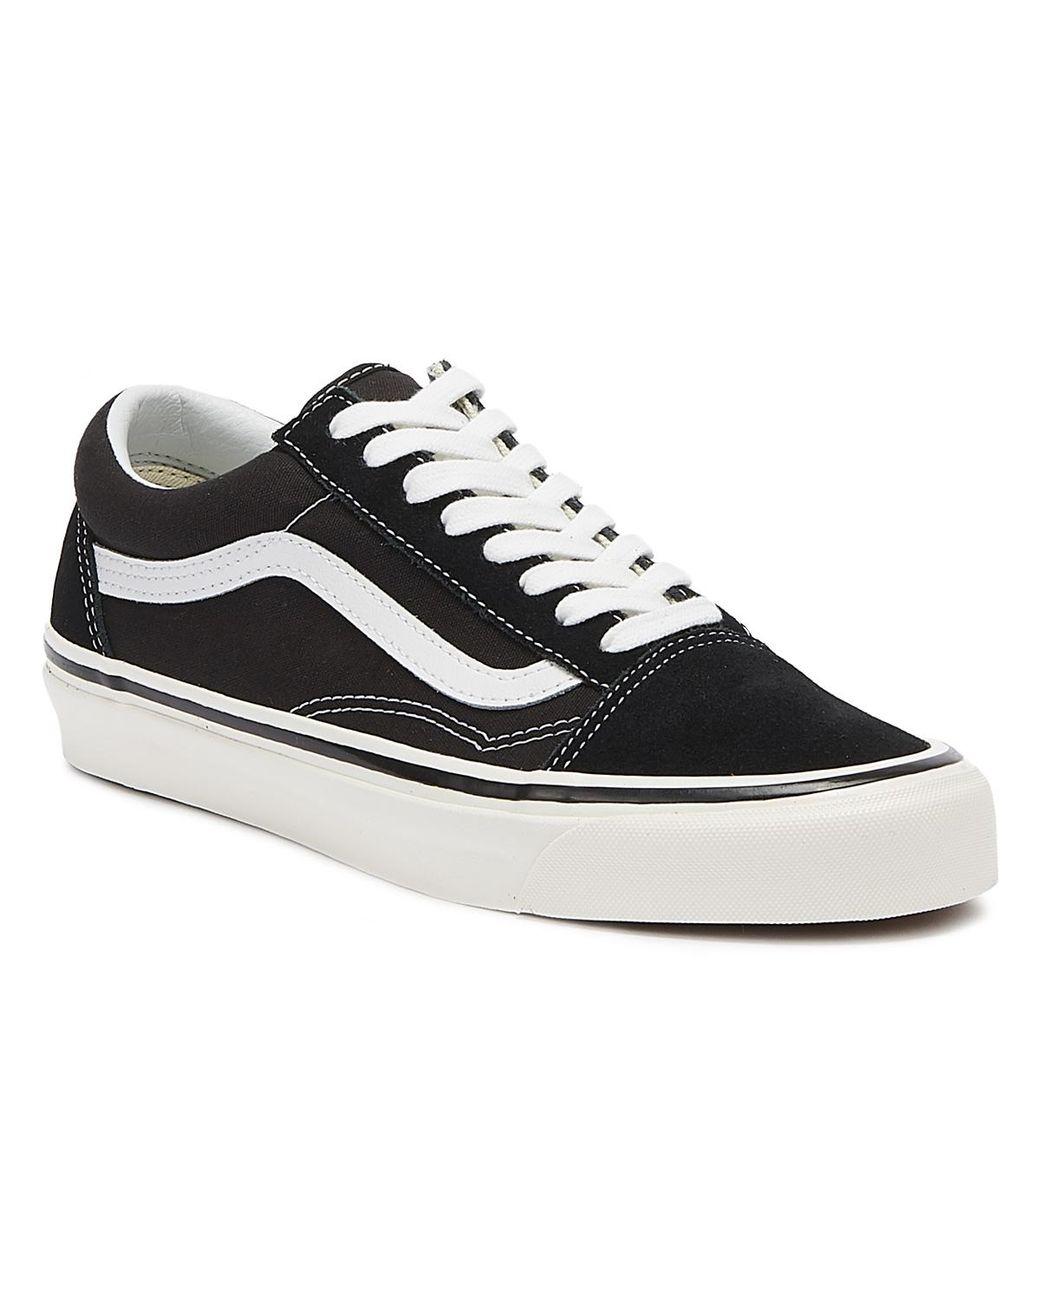 d404fe6236868 Men's Anaheim Factory Old Skool 36 Dx Black / True White Sneakers